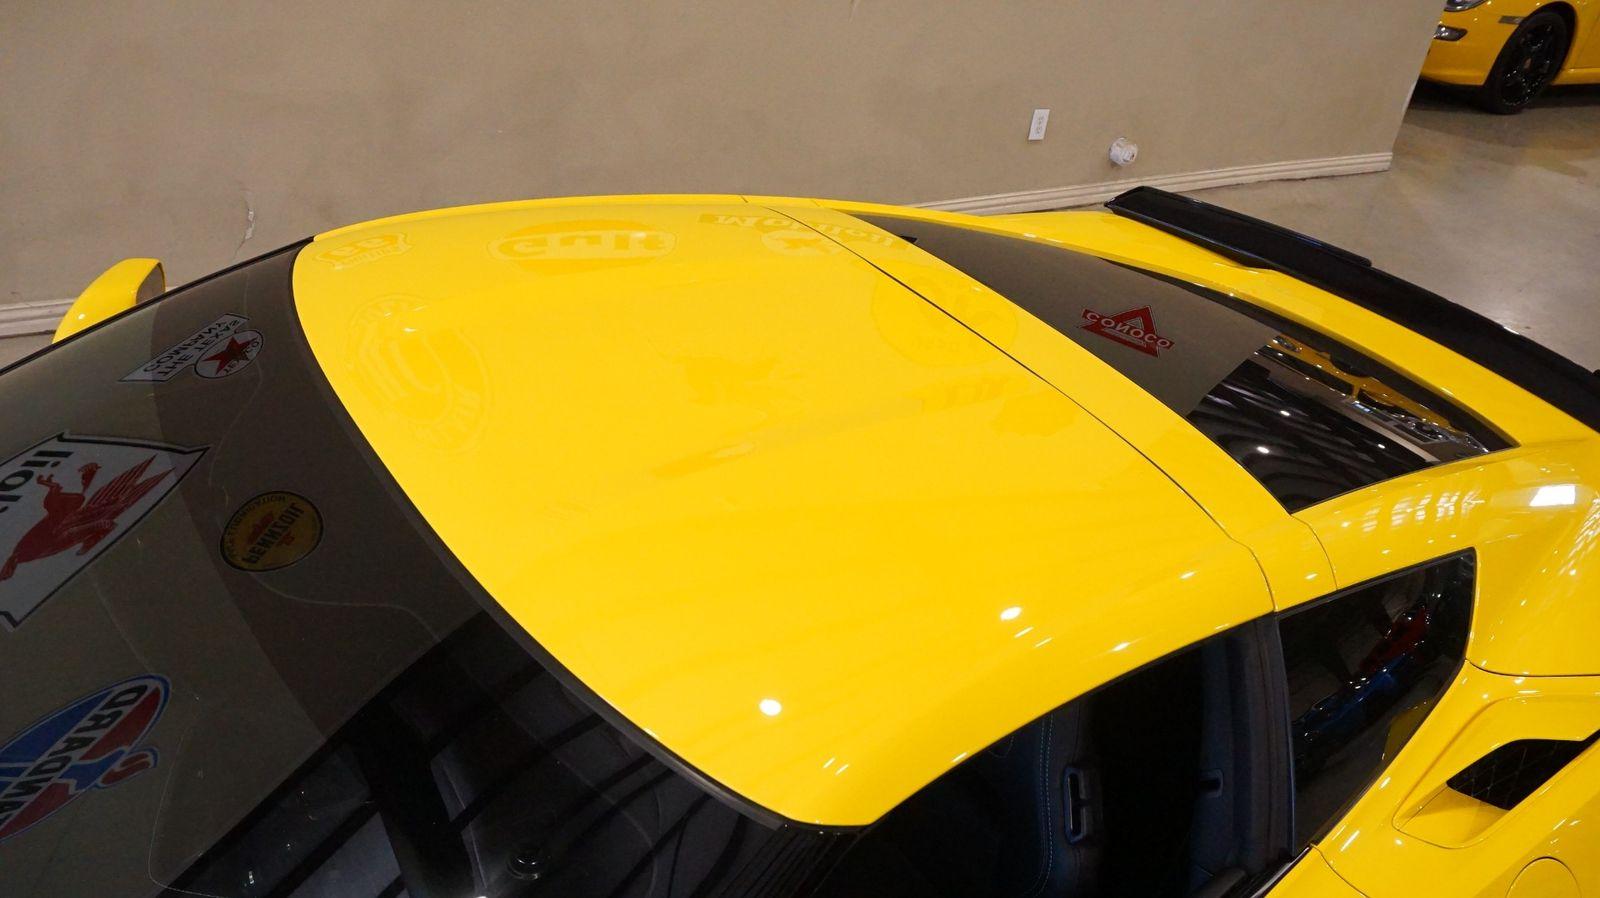 2017 Yellow Chevrolet Corvette Grand Sport 1LT | C7 Corvette Photo 8